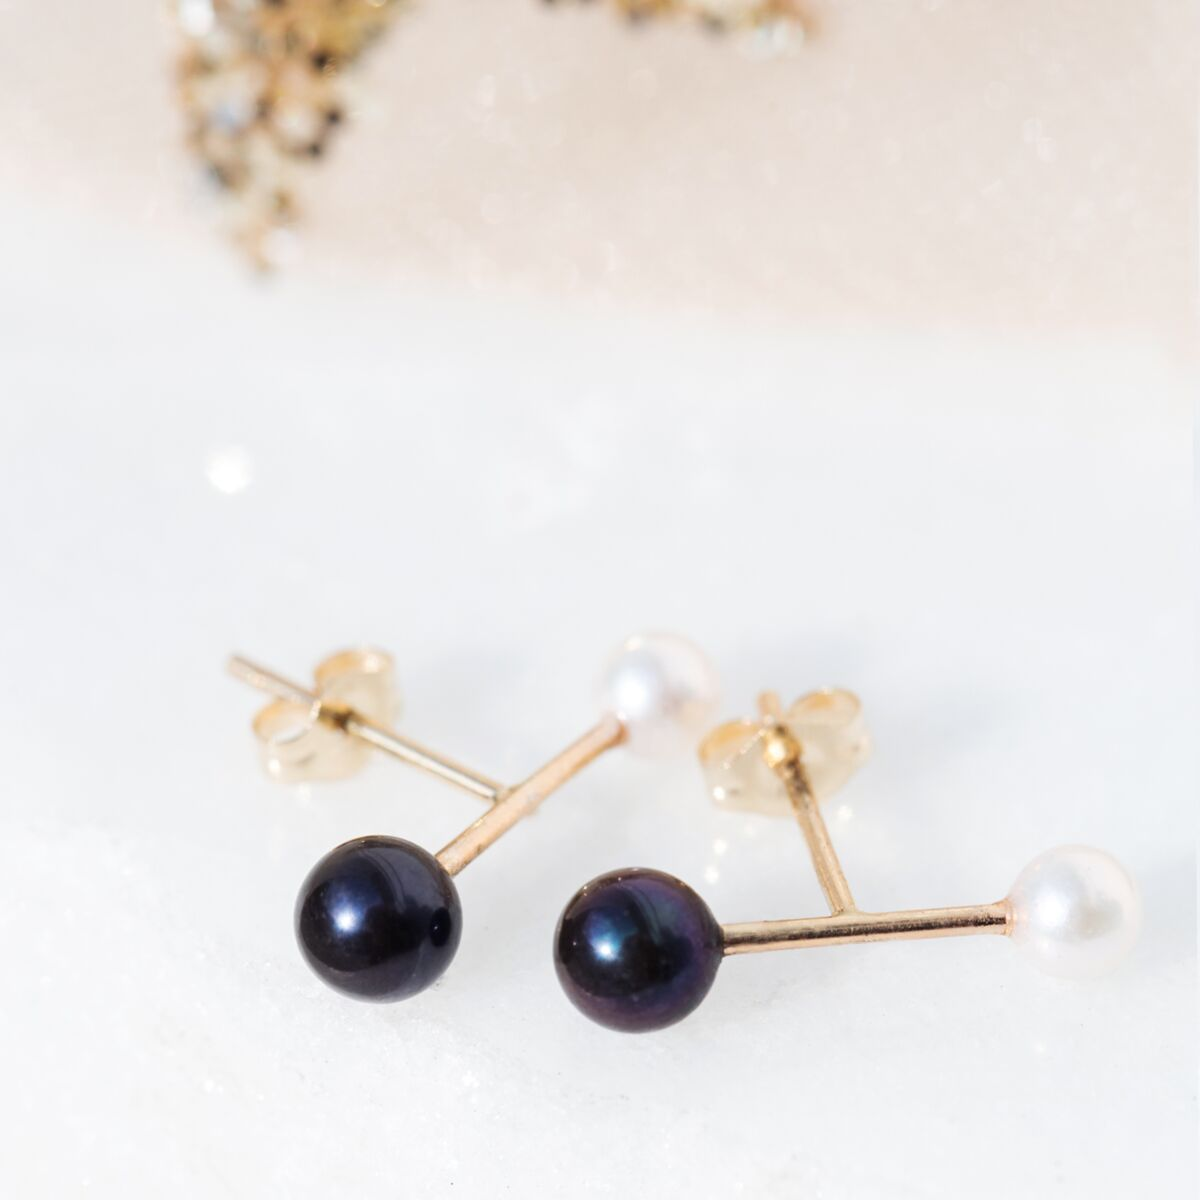 Majorette Pearl Earrings image